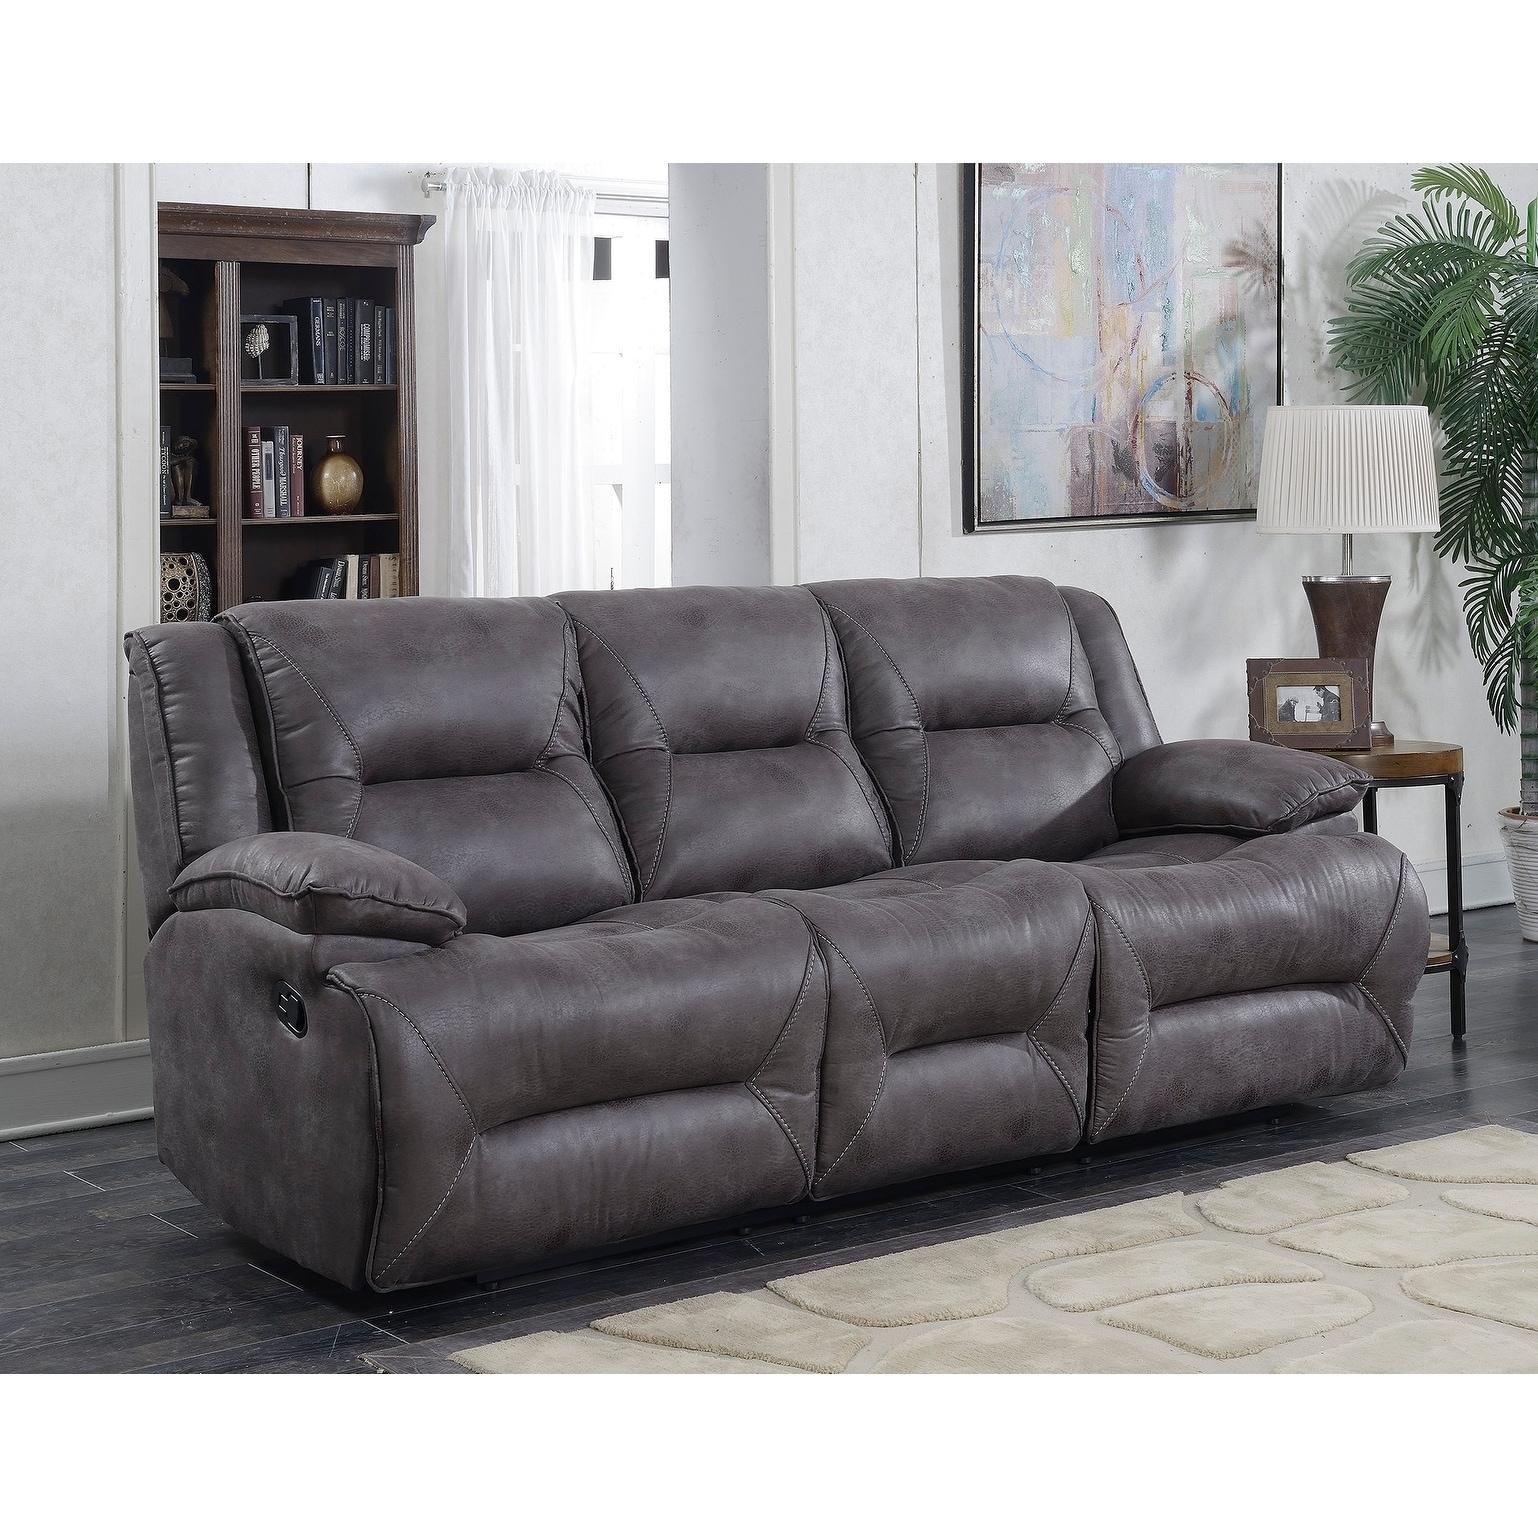 Dylan Dual Lay Flat Reclining Sofa